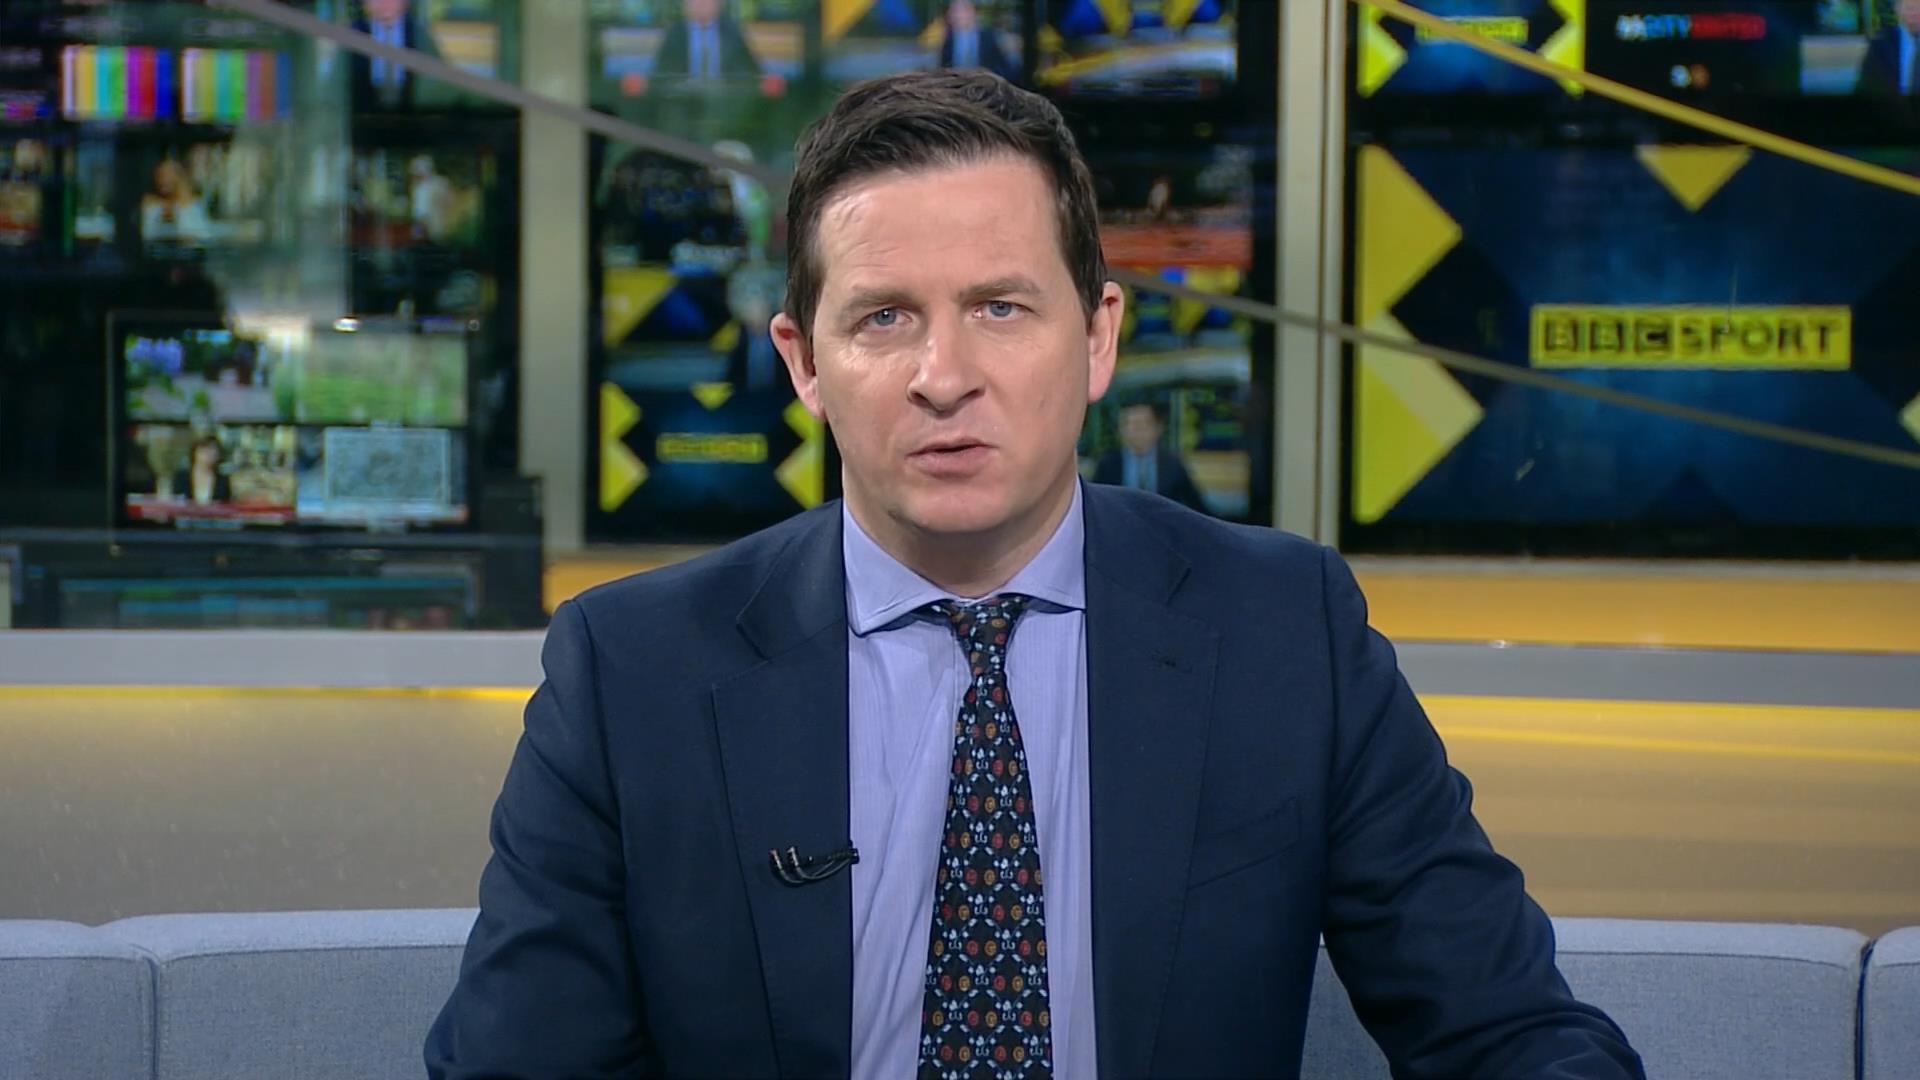 Olly Foster - BBC Sport Presenter (1)